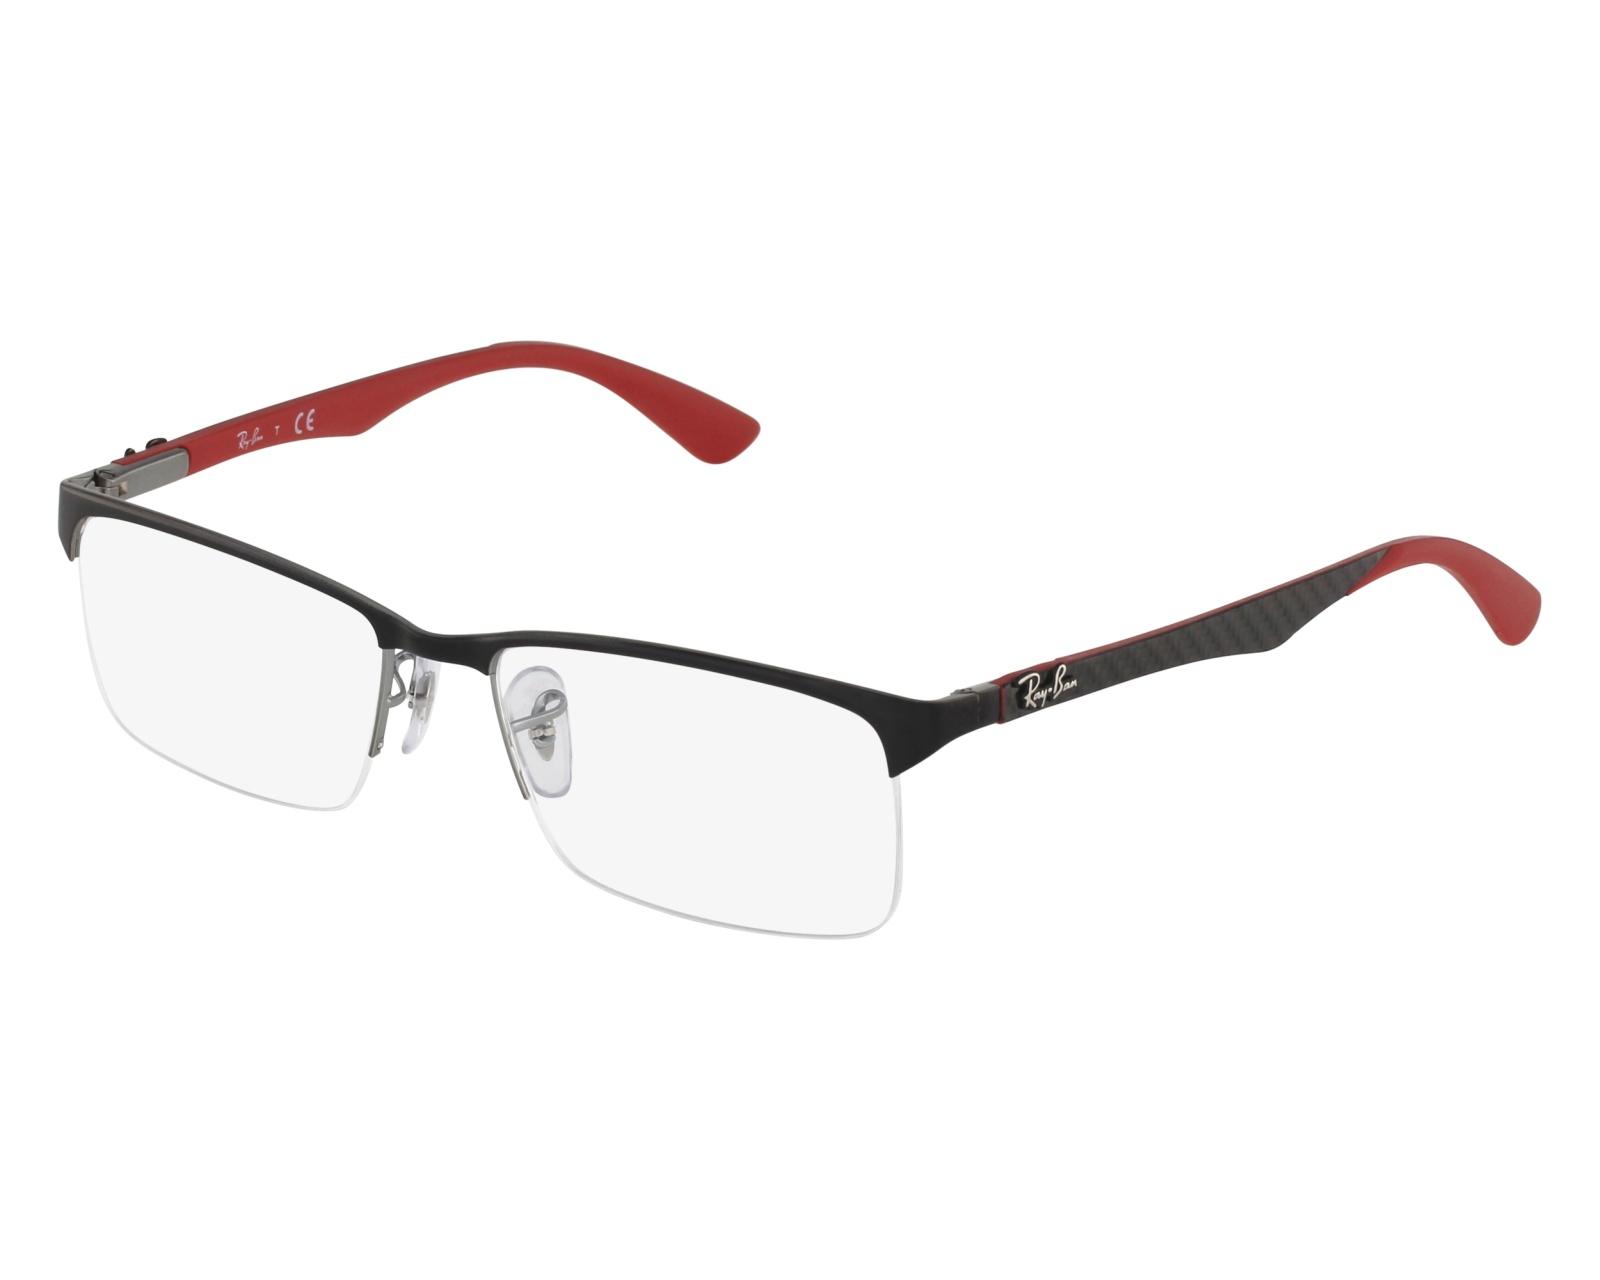 Ray-Ban Eyeglasses RX-8411 2509 Black | visio-net.co.uk